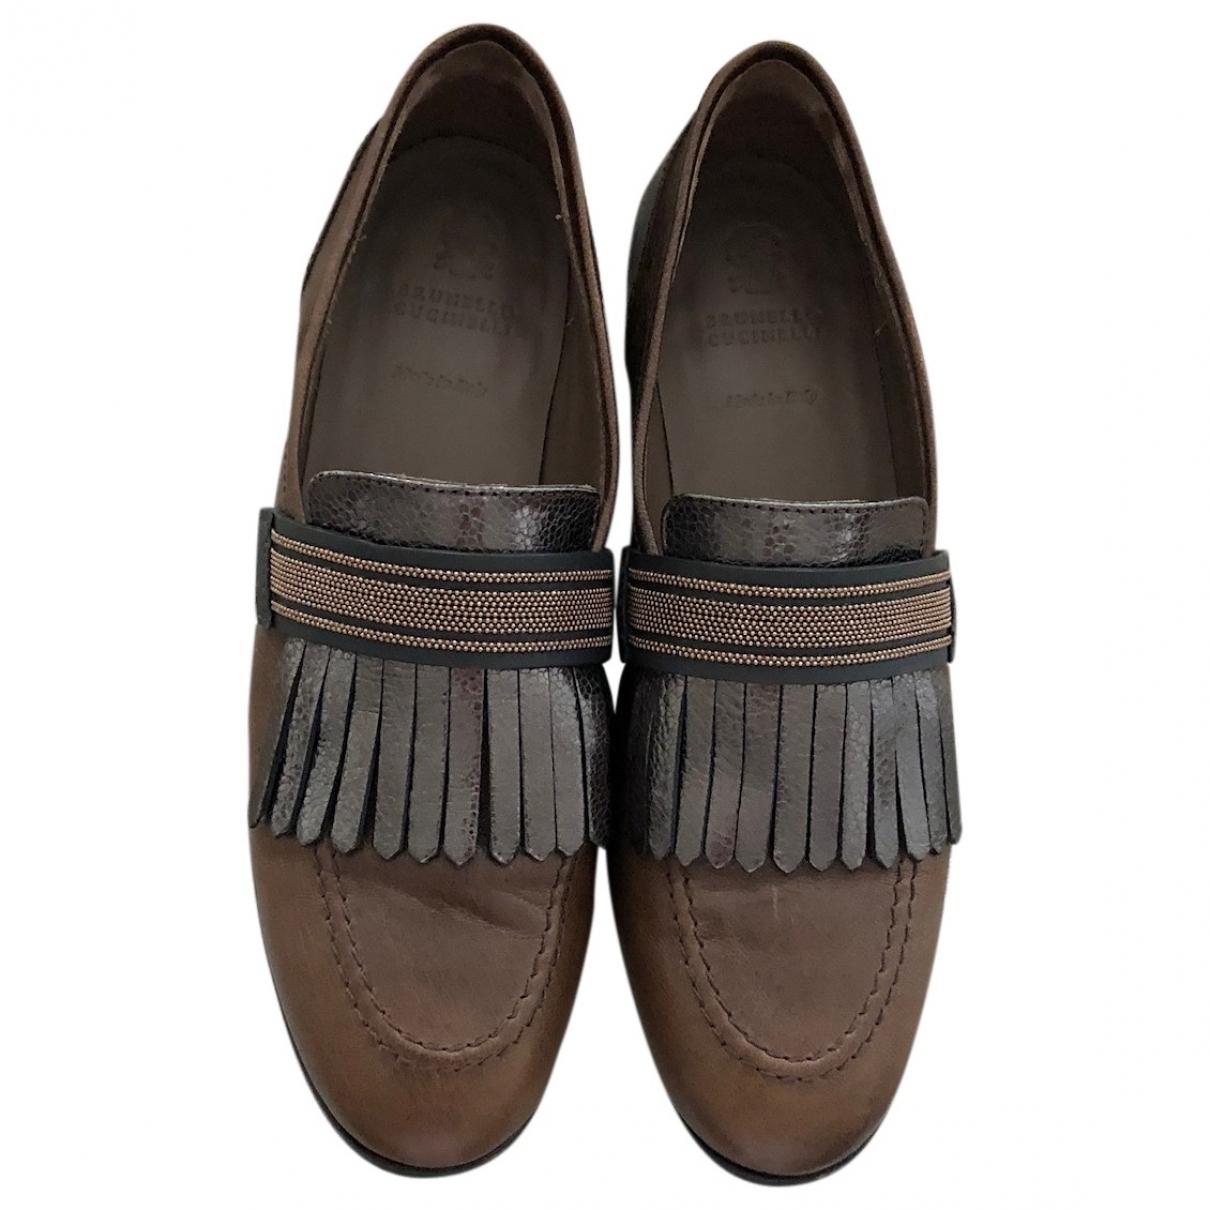 Brunello Cucinelli \N Brown Leather Flats for Women 37 EU